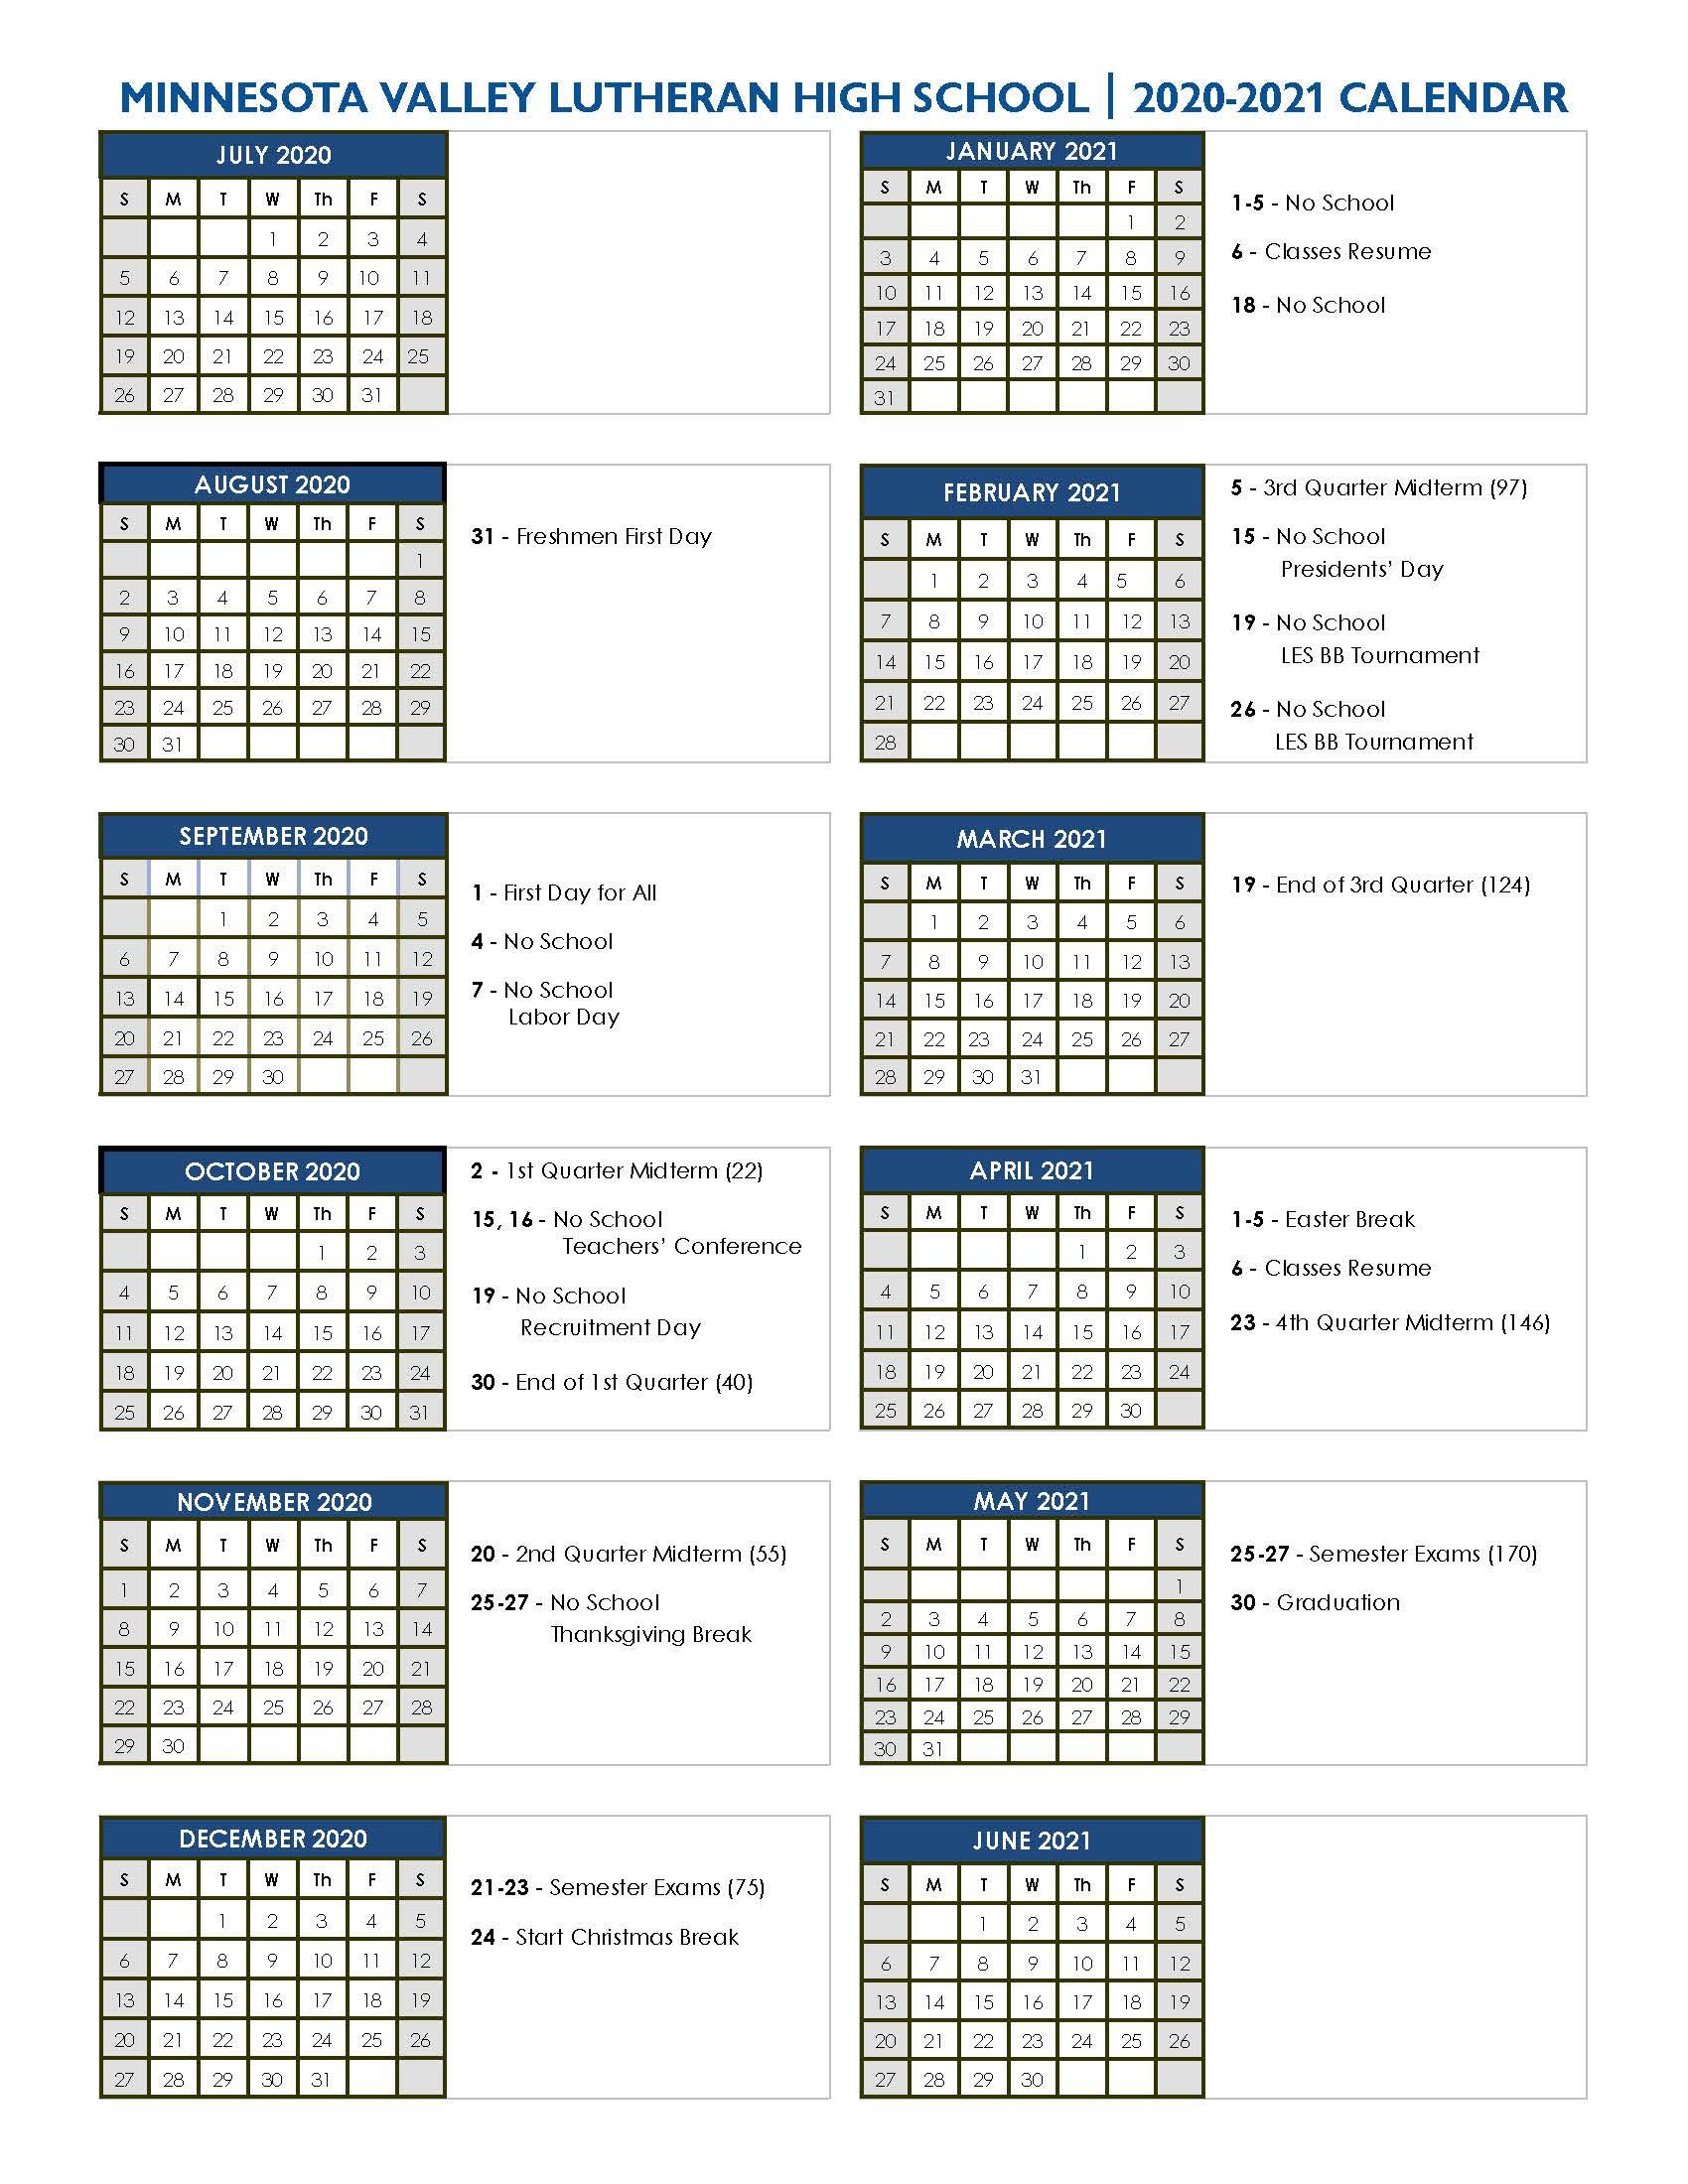 University Of Arizona Calendar 2021 Academic Calendar 2020 2021 | Minnesota Valley Lutheran High School